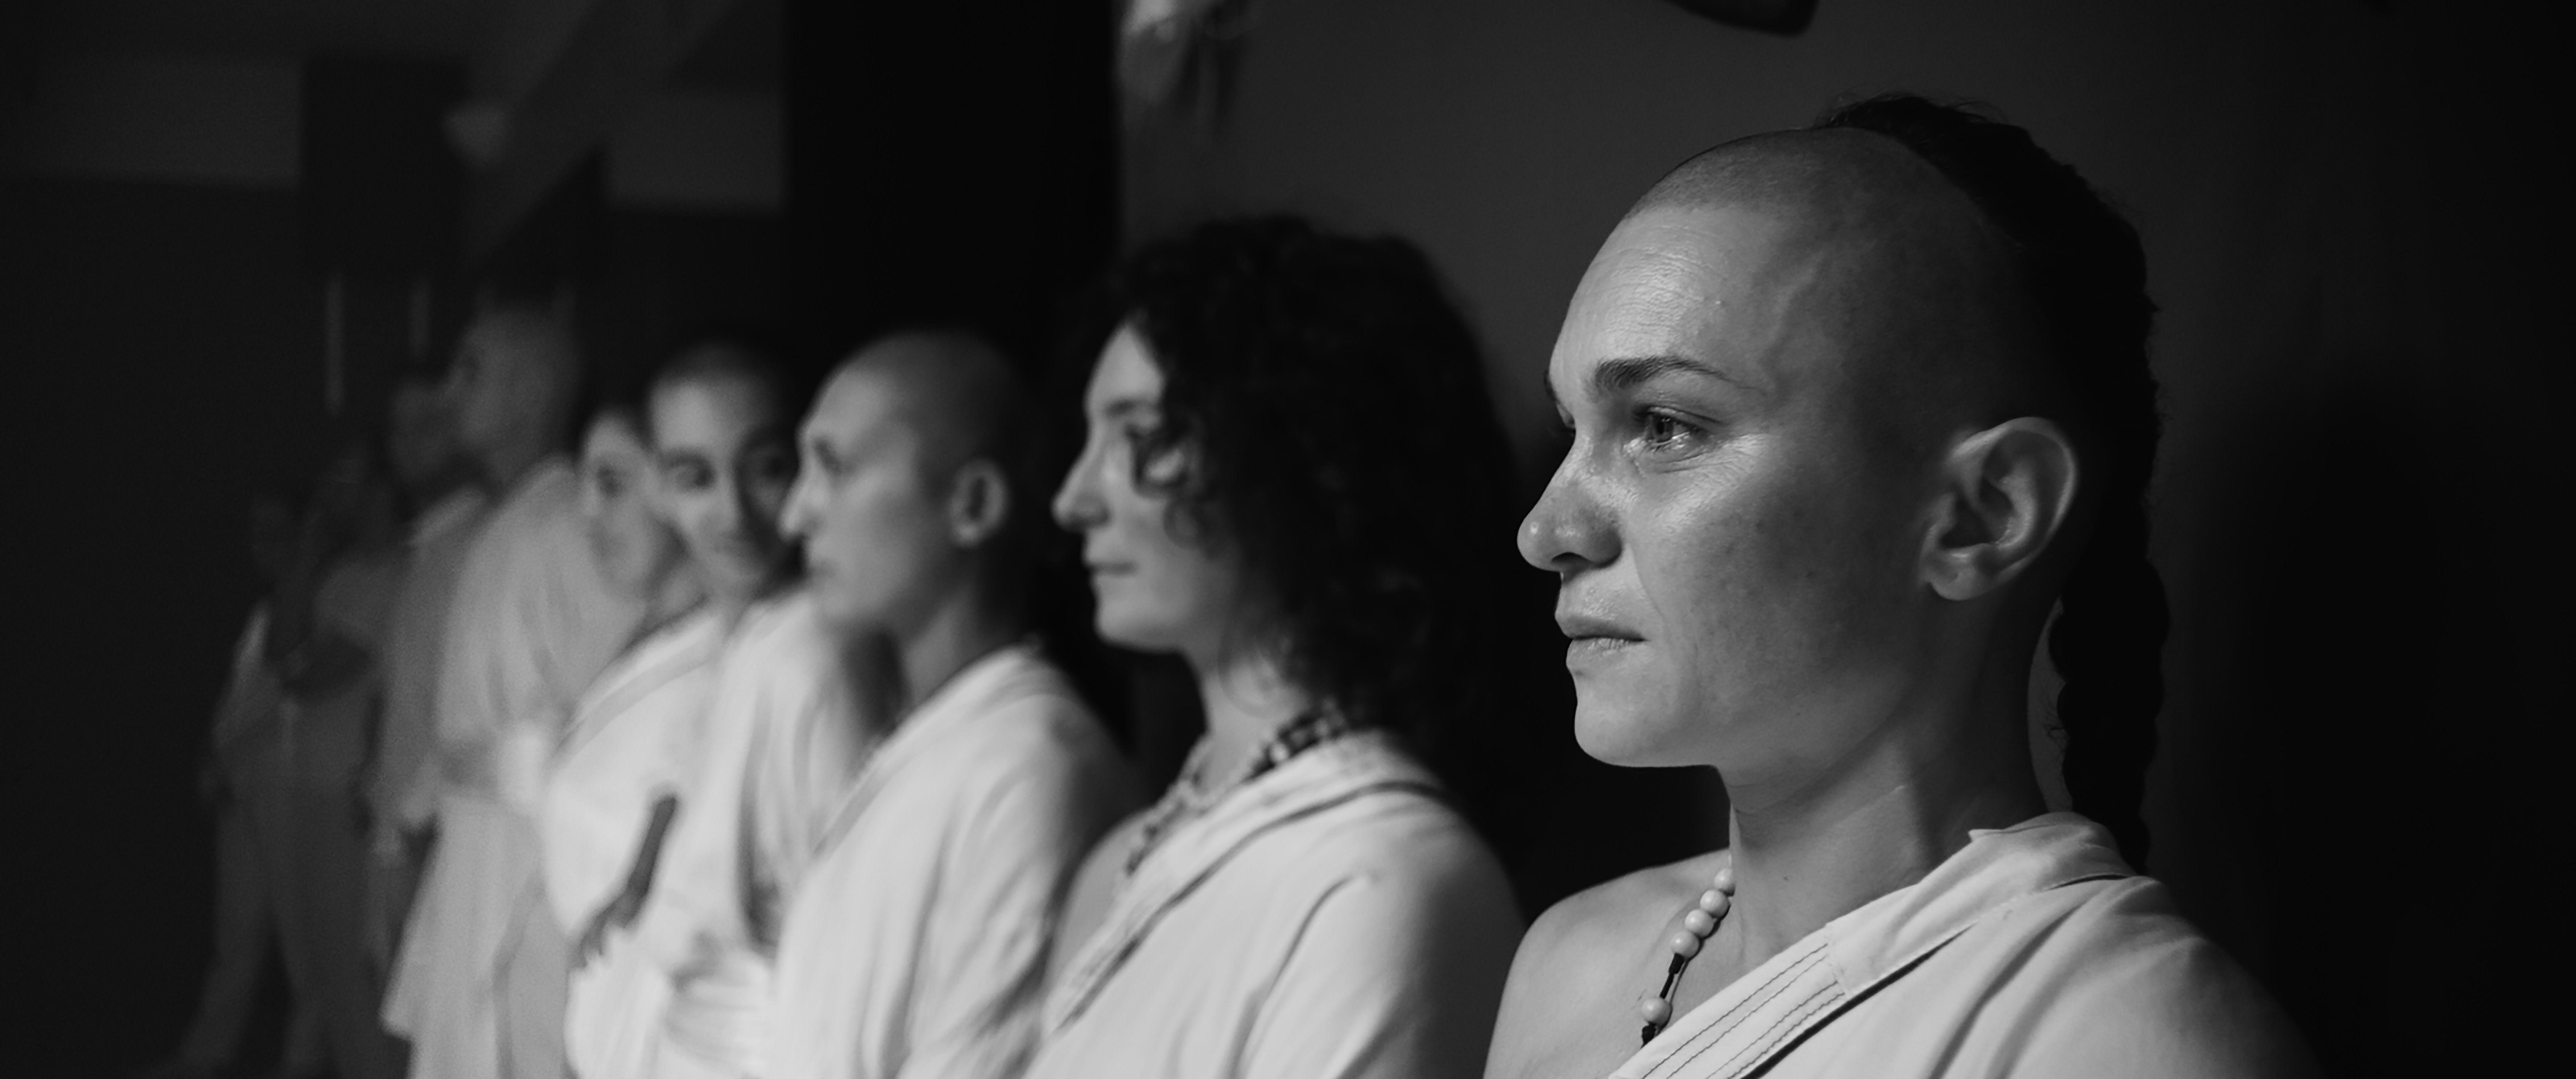 faith-valentina-pedicini-Biografilm-Festival-2020-MYmovies